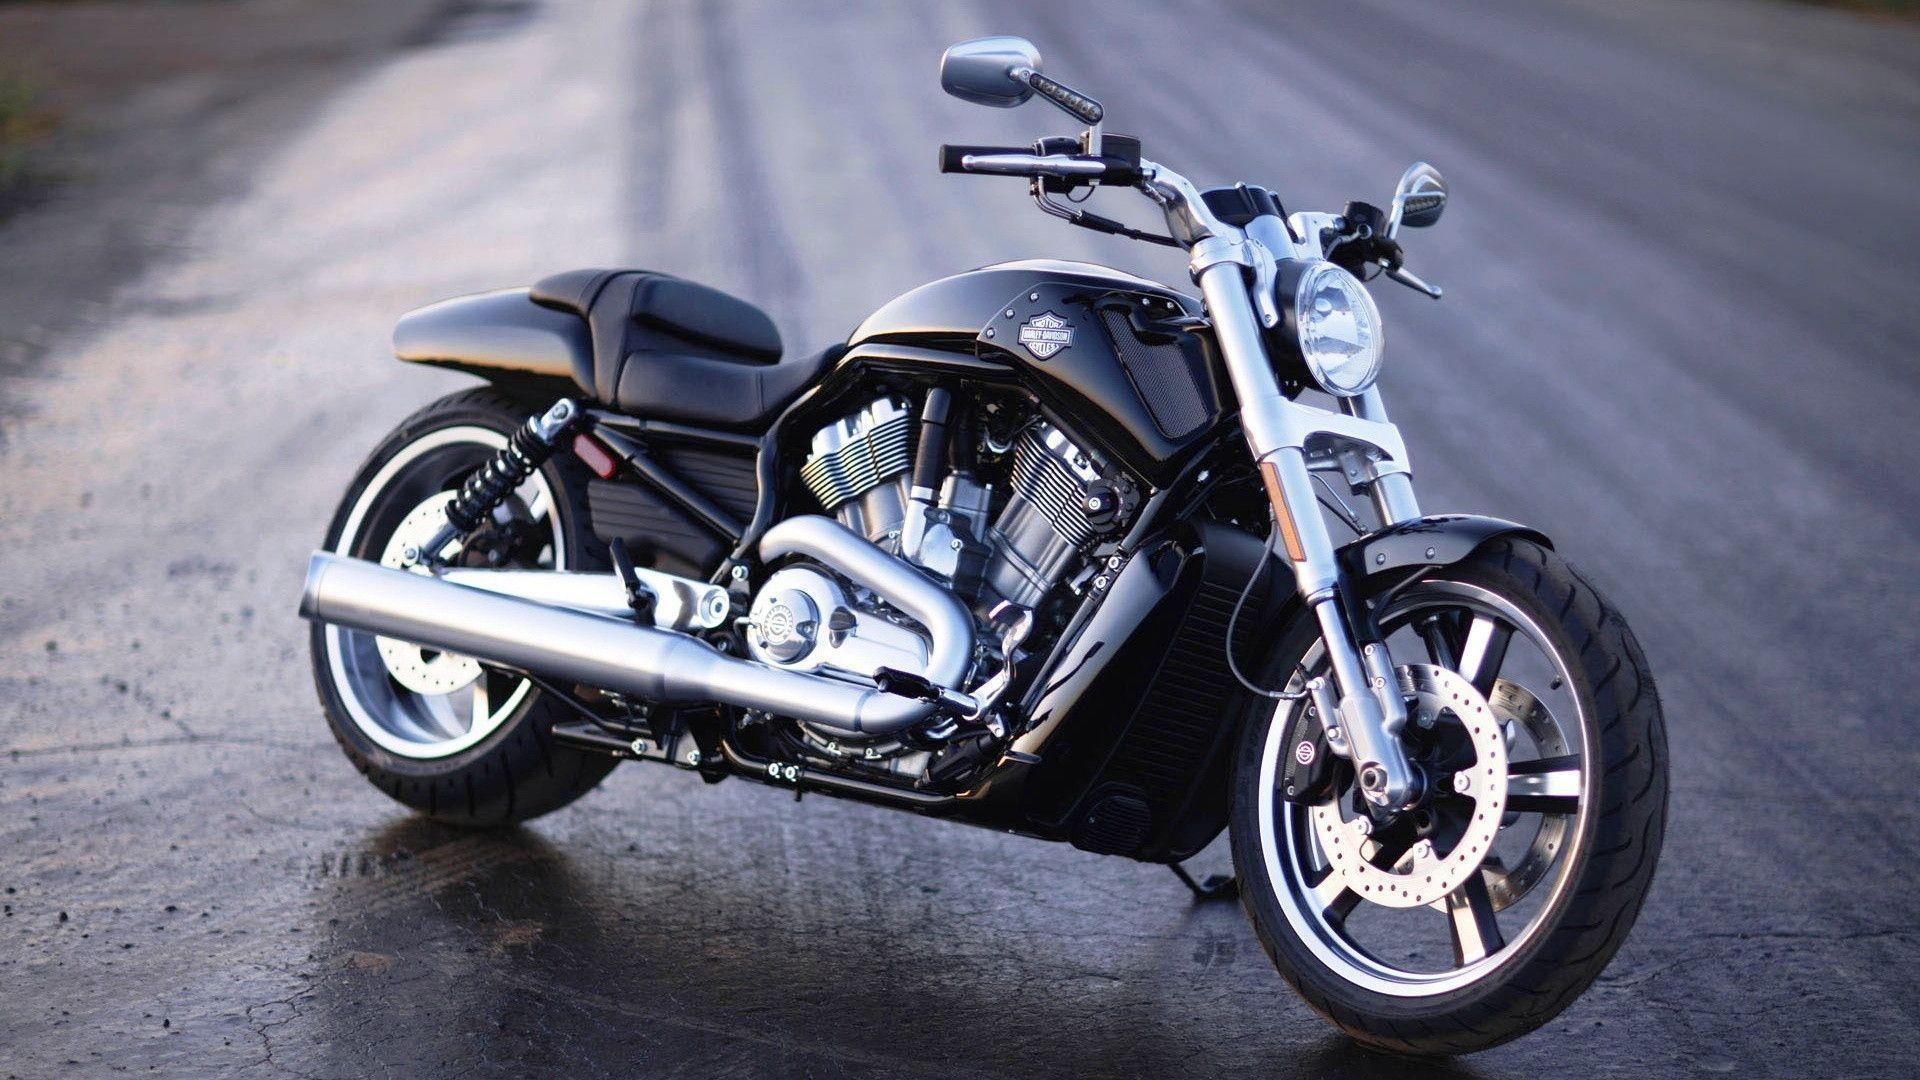 Harley Davidson V Rod Muscle Wallpapers 1920x1080